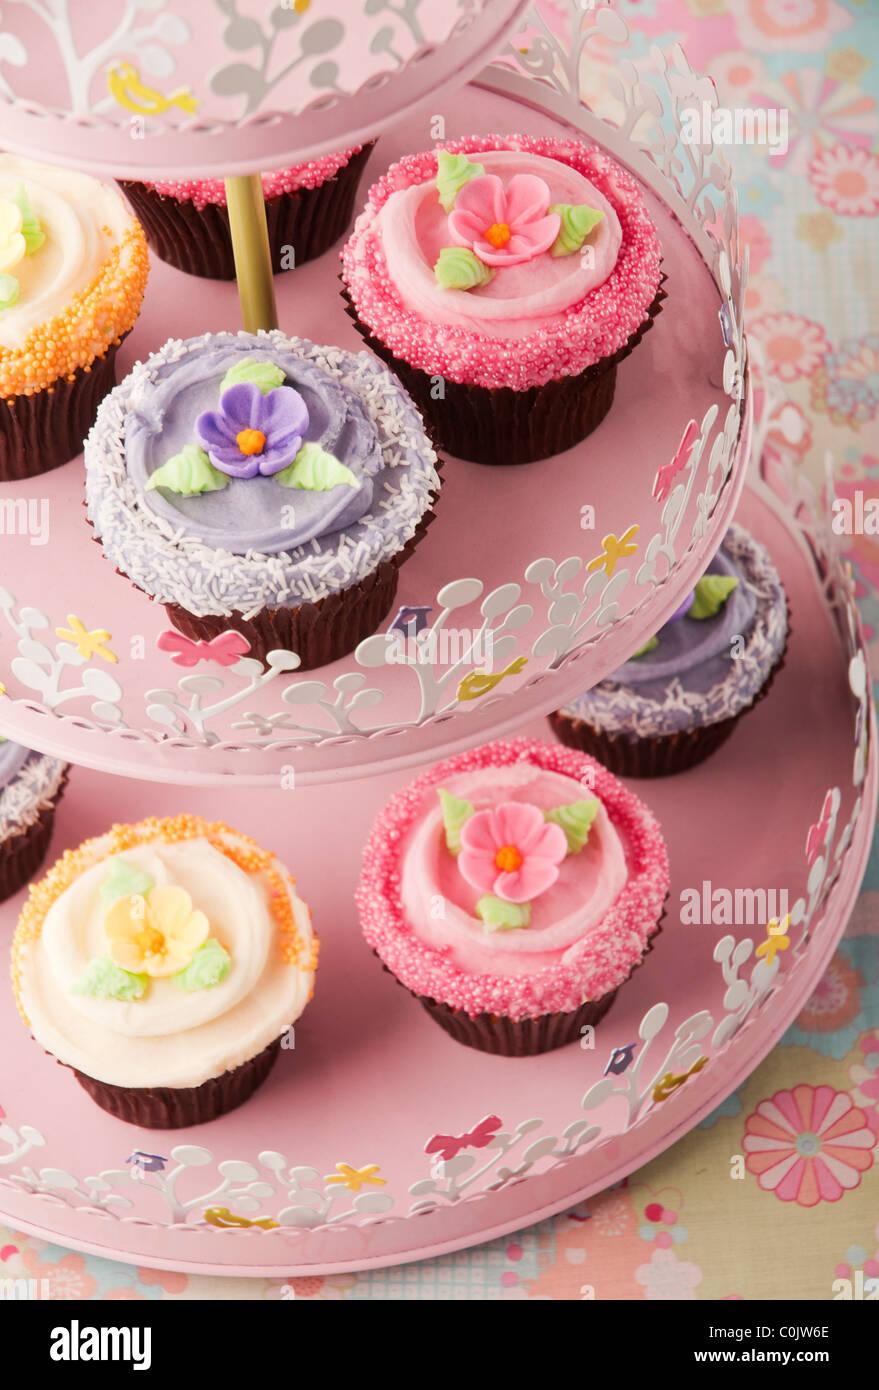 rosa gelb lila farbige Tasse Kuchen am stand Stockbild